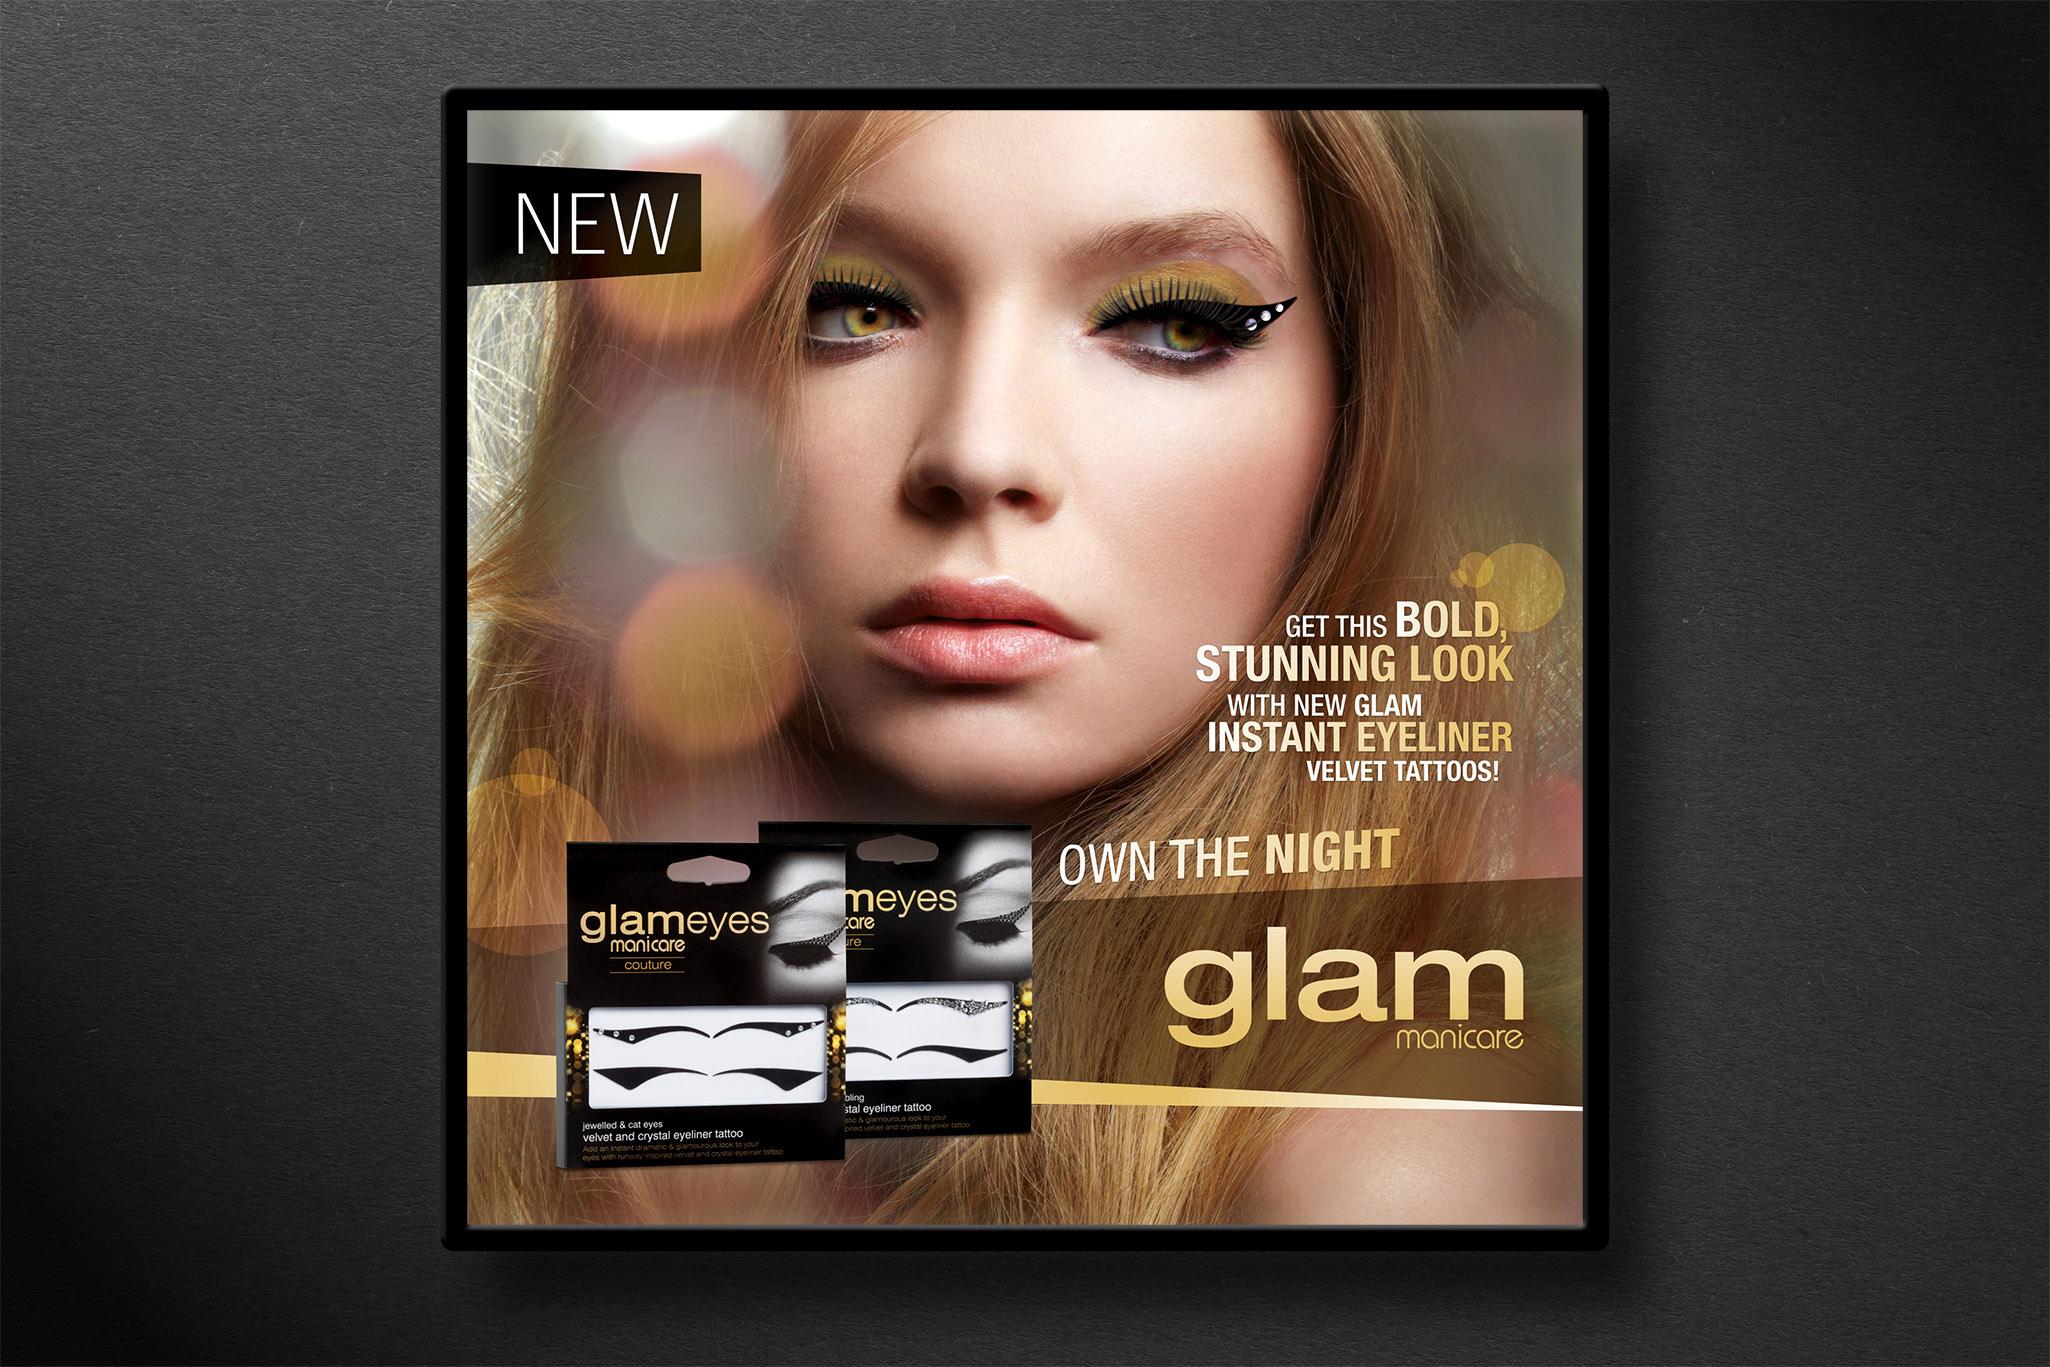 McPhersons_GLAM-POS-lightbox.jpg